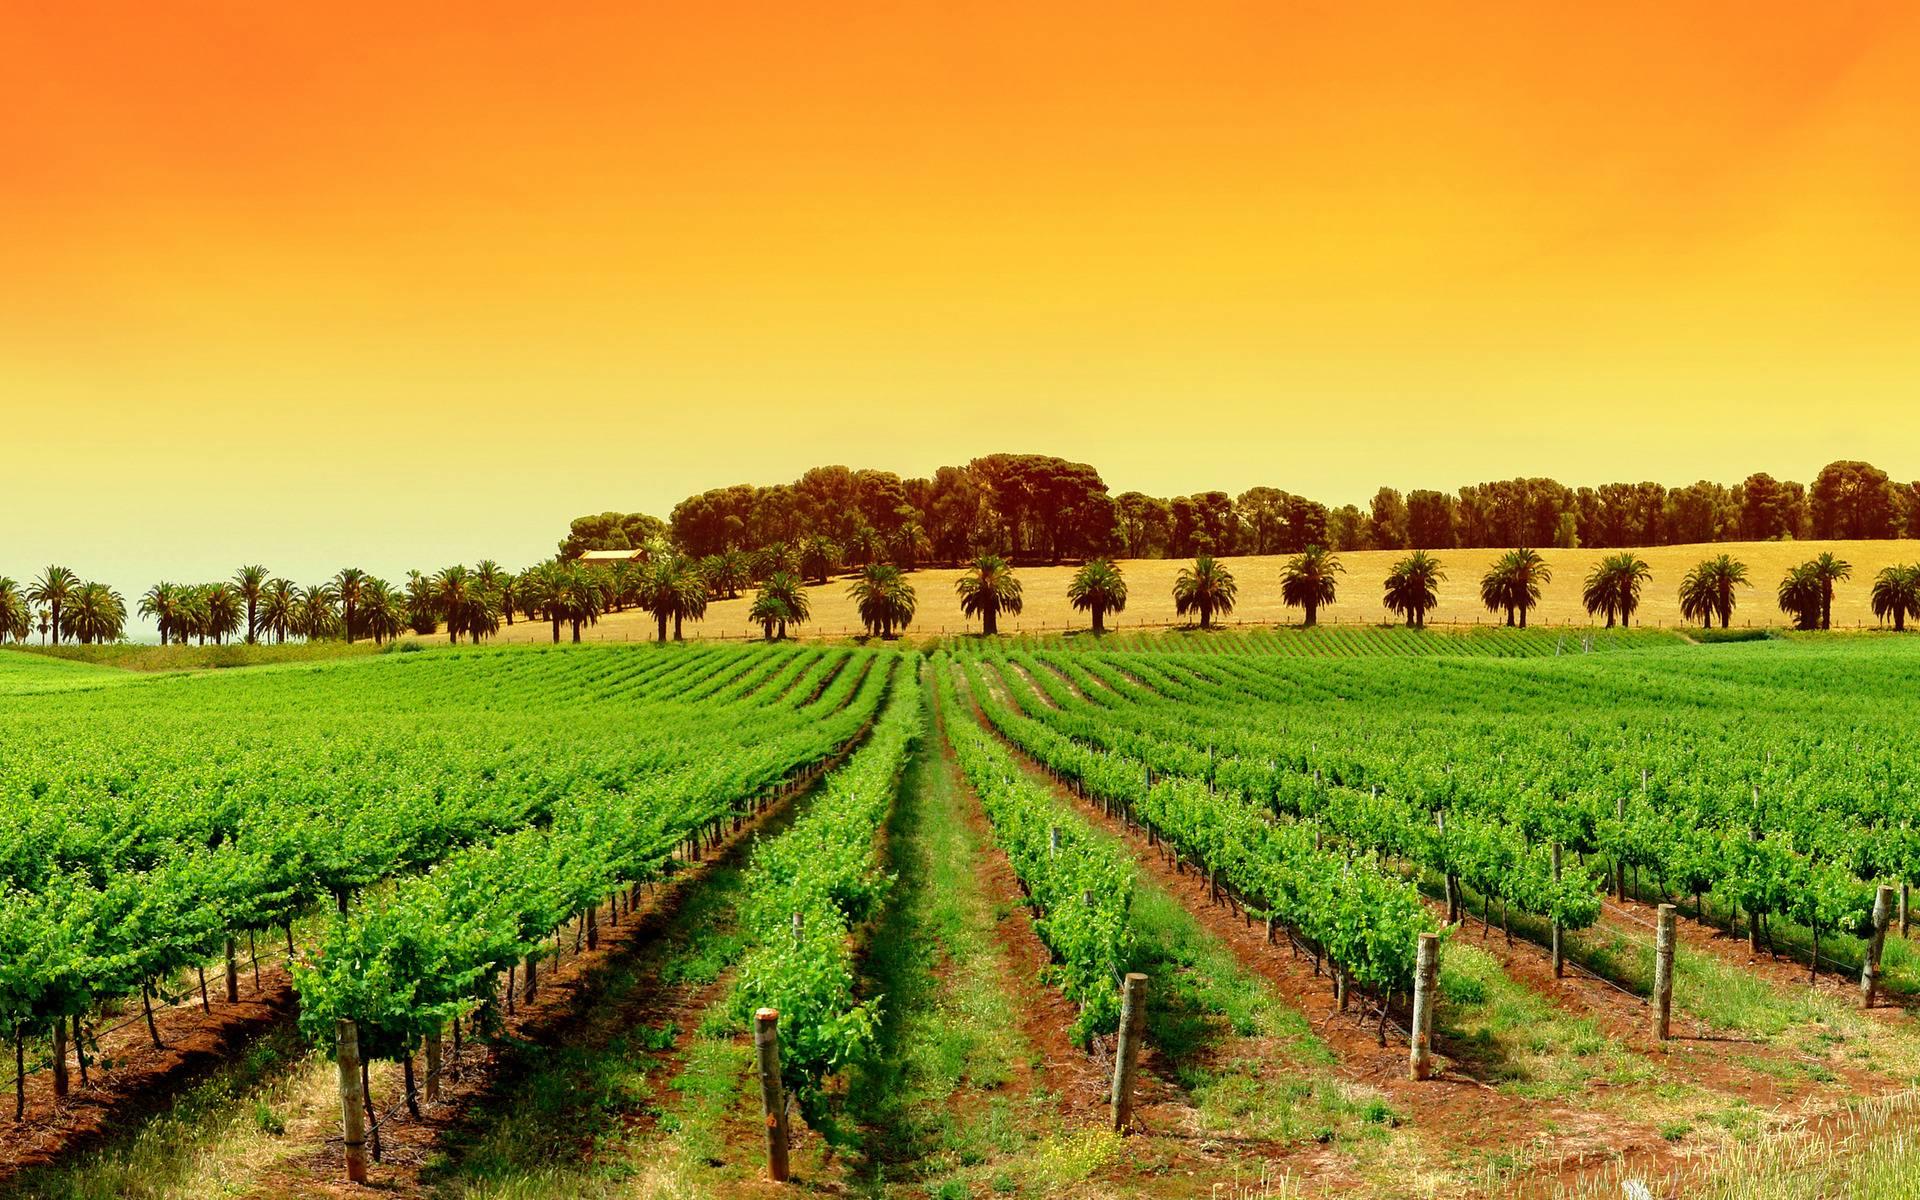 Vineyard Wallpapers 1920x1200